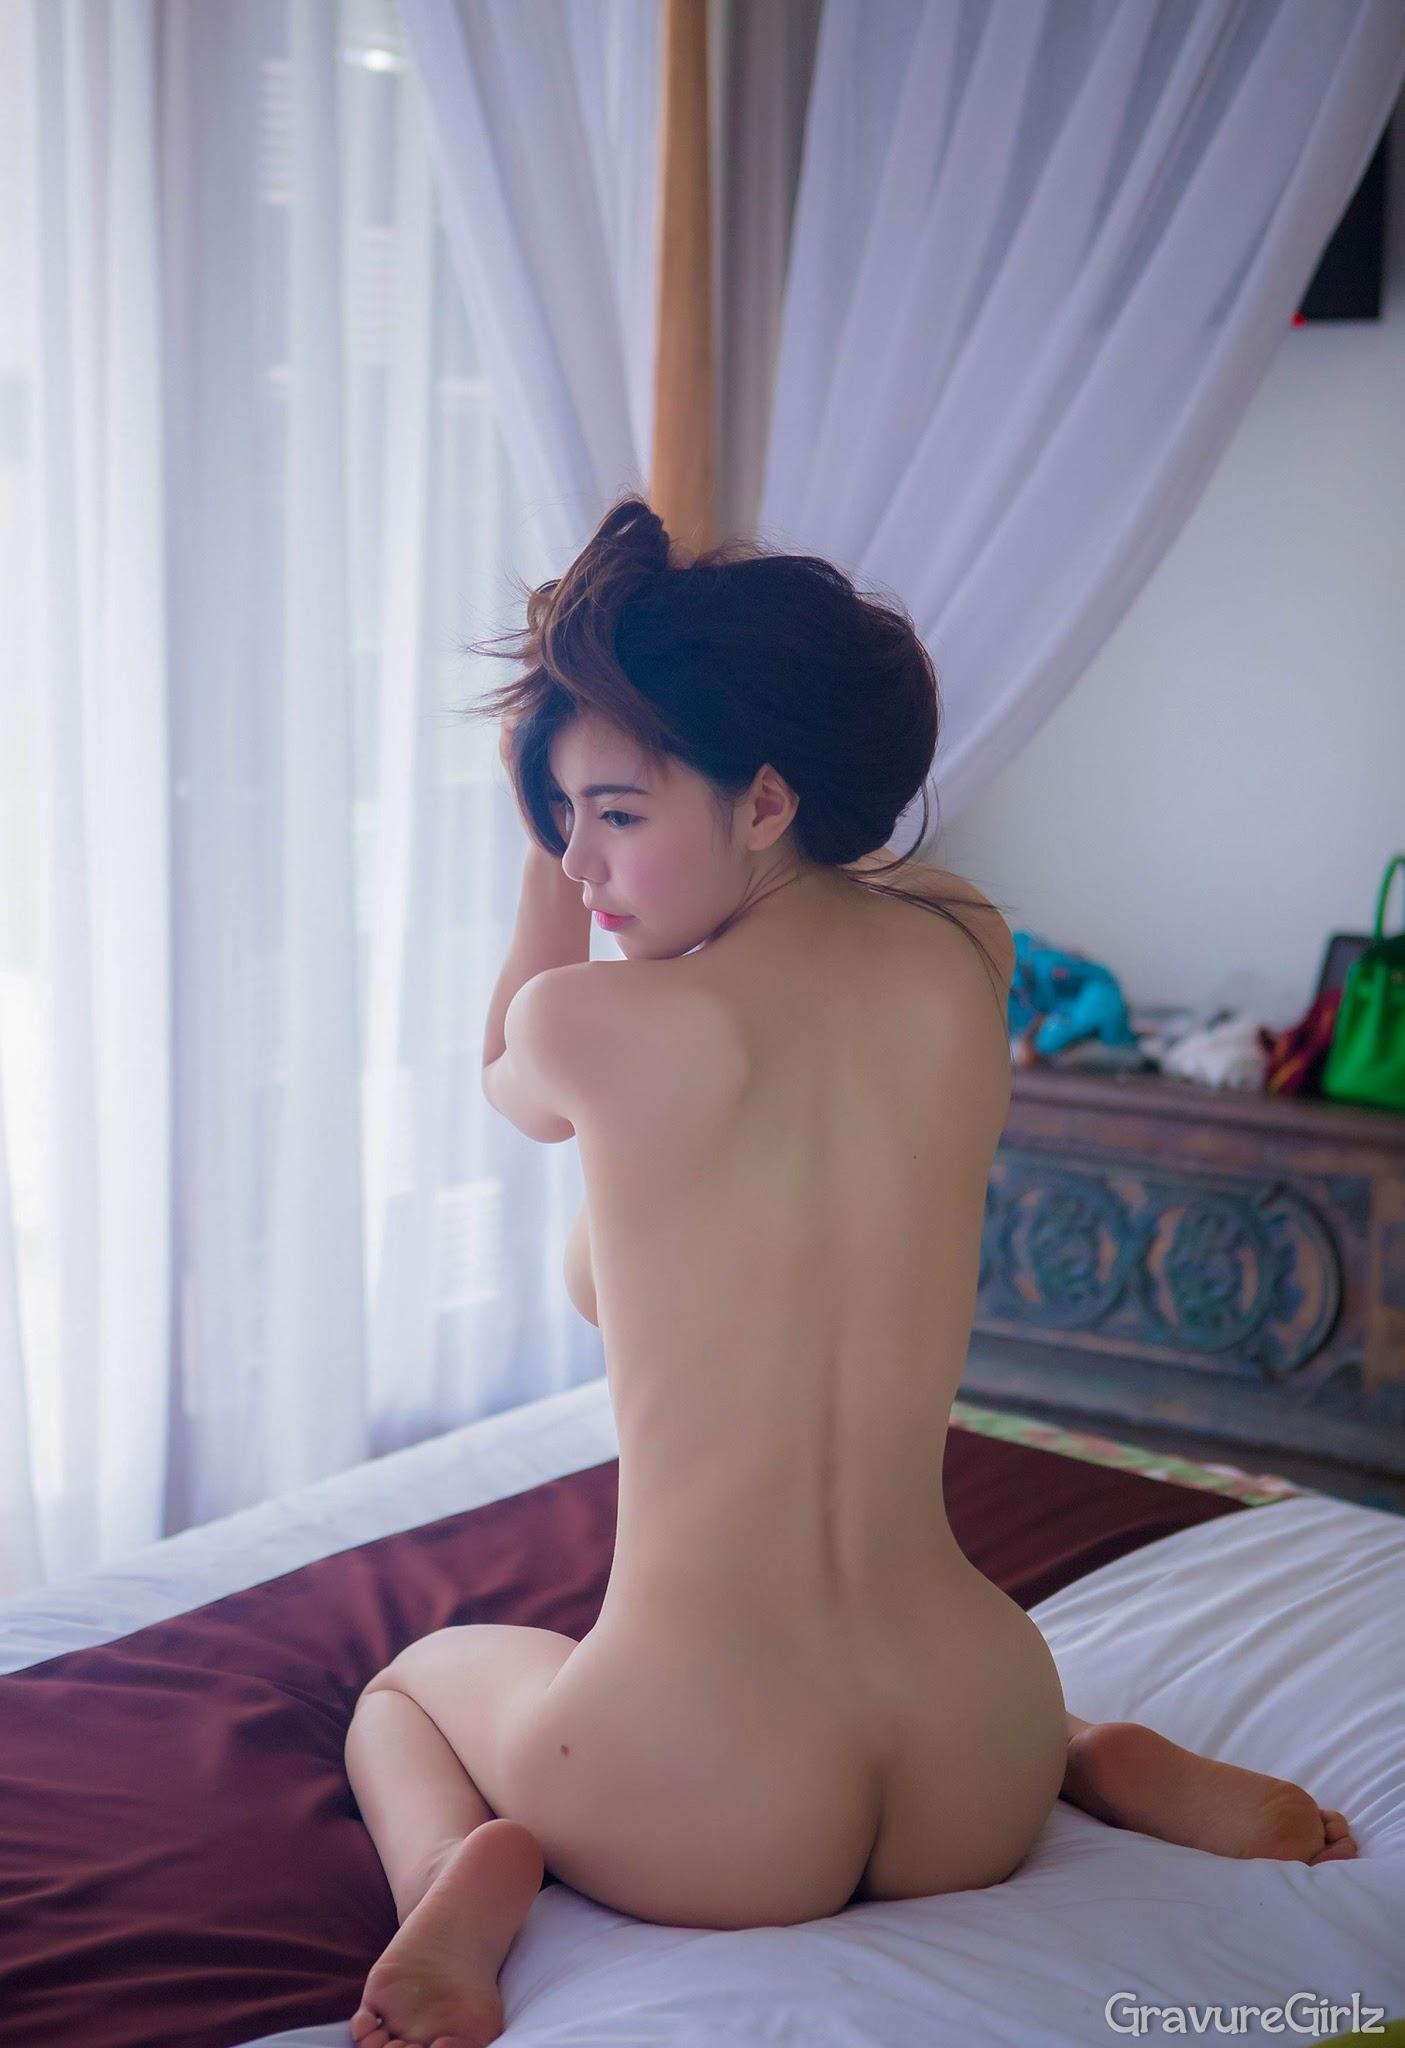 Shen Jiaxi 沈佳熹 Fine Nudity @ IMISS愛蜜社 | Page 2 of 5 ...